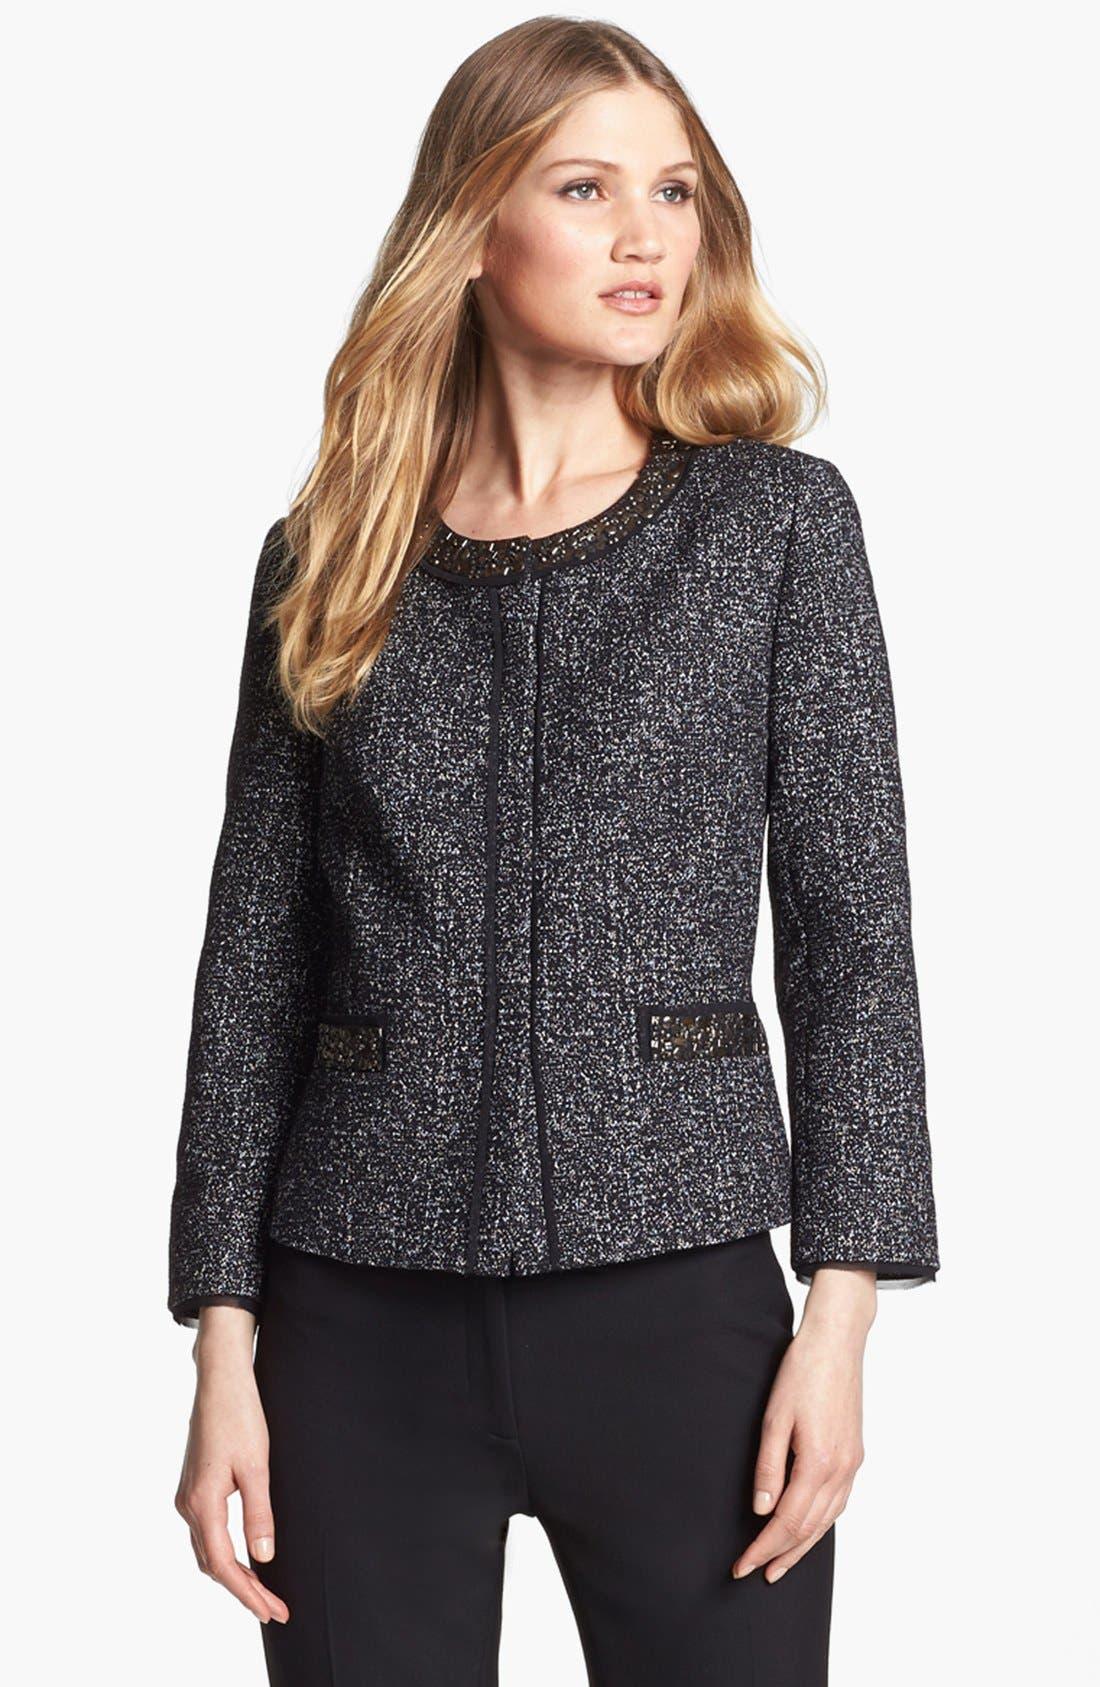 Alternate Image 1 Selected - Classiques Entier® 'Monte Weave' Embellished Jacket